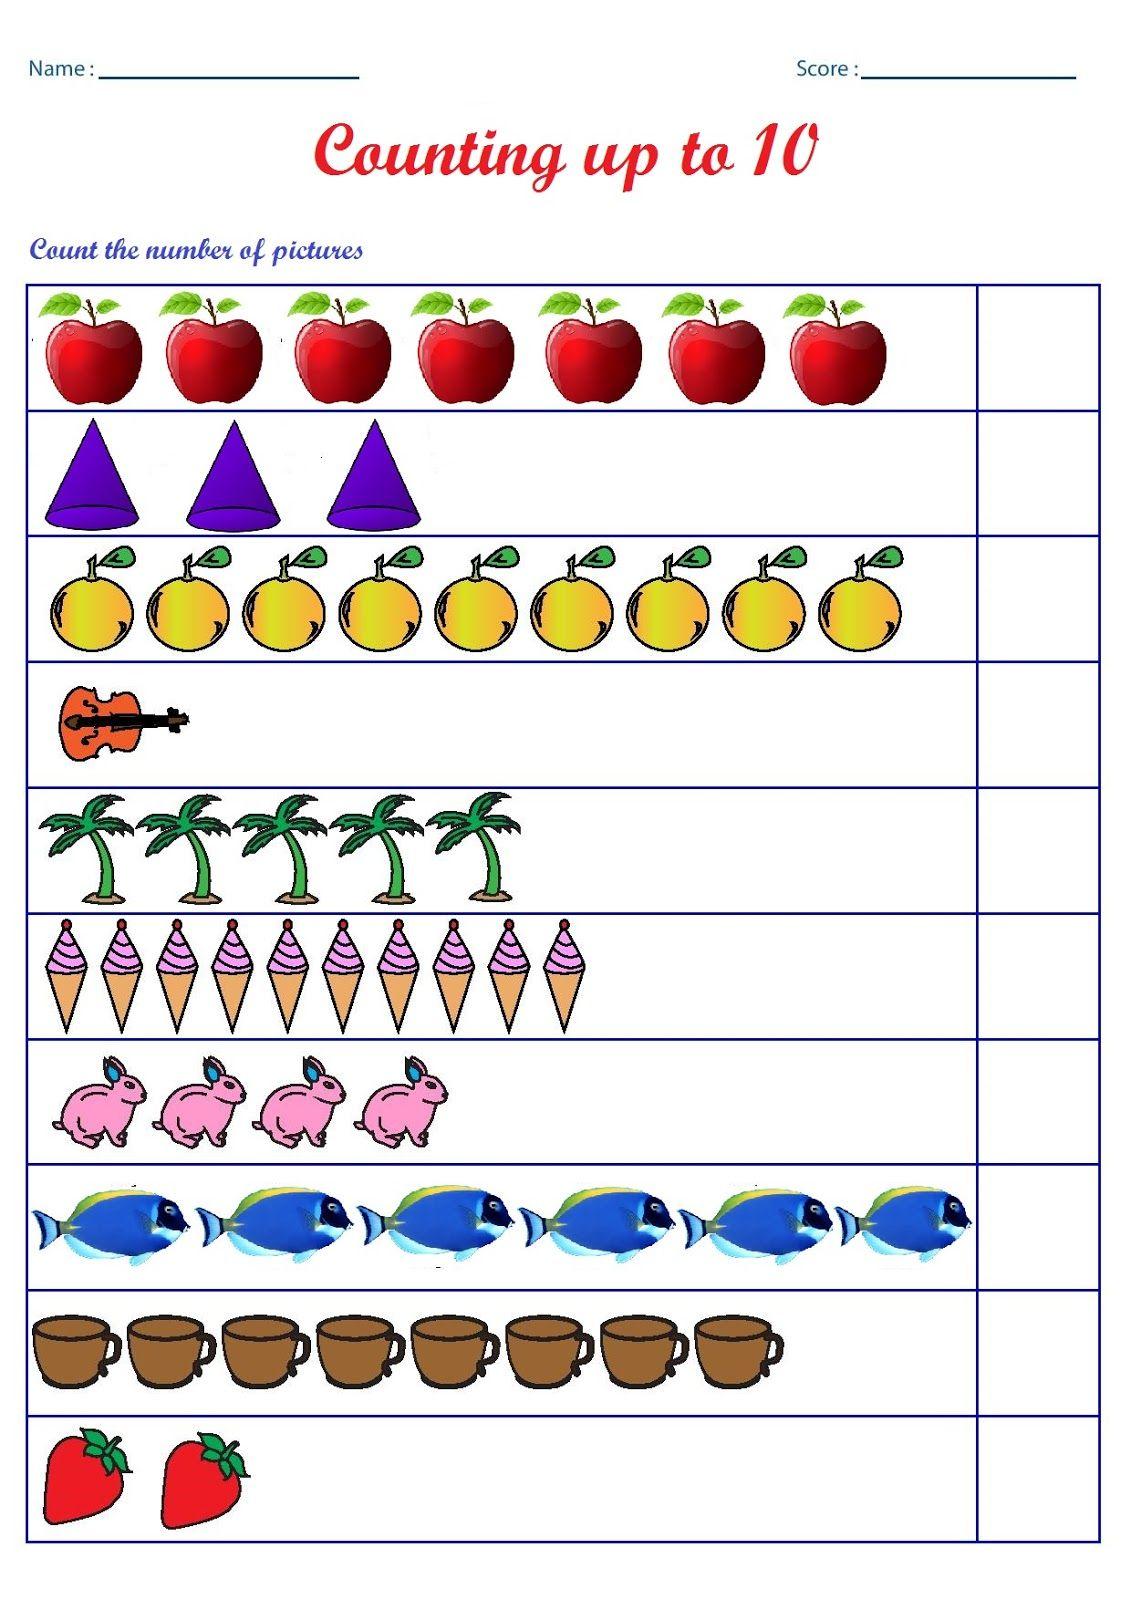 Worksheets Worksheet-anak-2-tahun pin by sarah tawfik on counting worksheets pinterest pipes math mathematics and bongs calculus